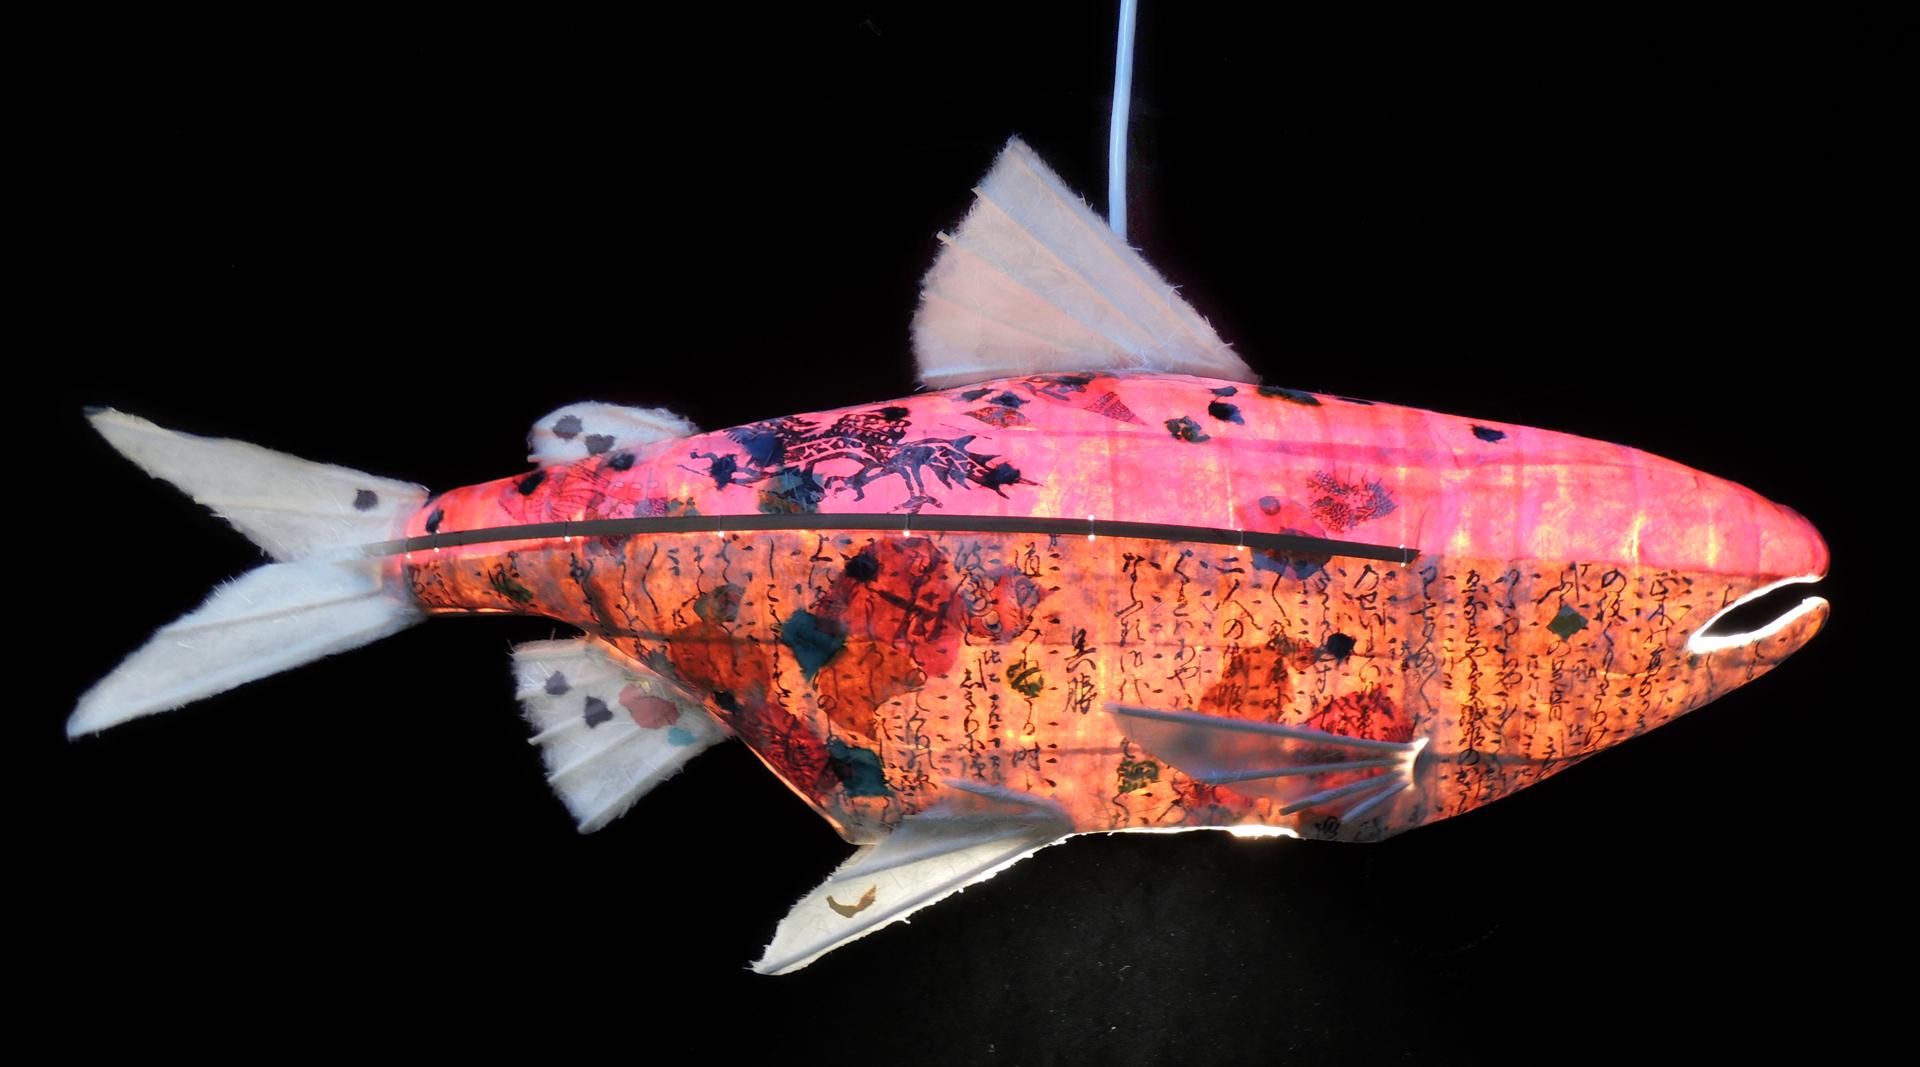 Warm Back Salmon Chandelier by Elaine Hanowell